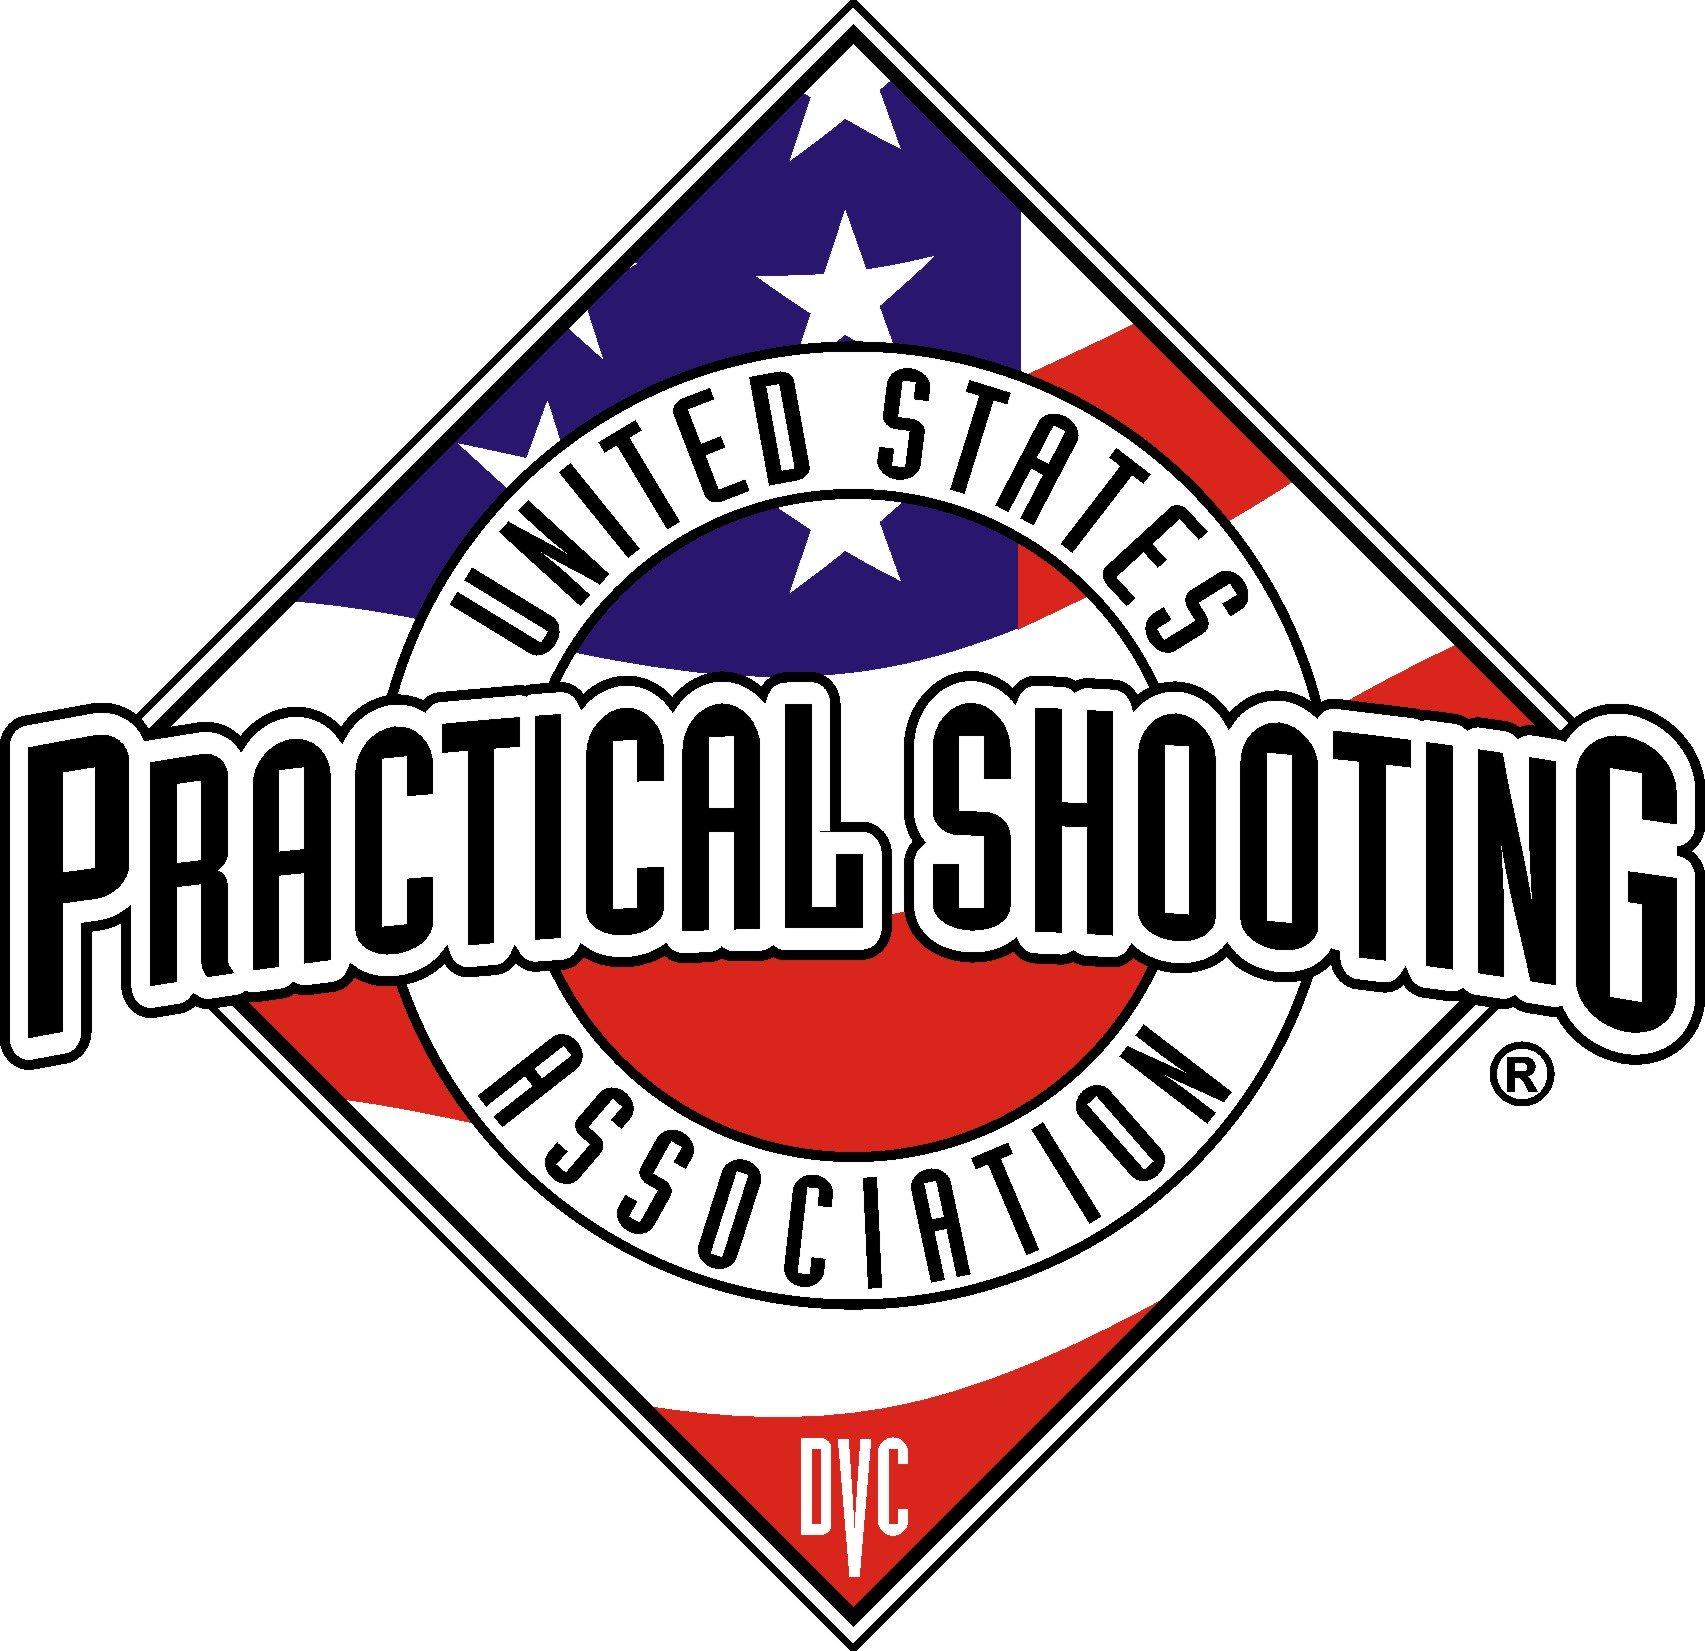 USPSA / Practical Shooting